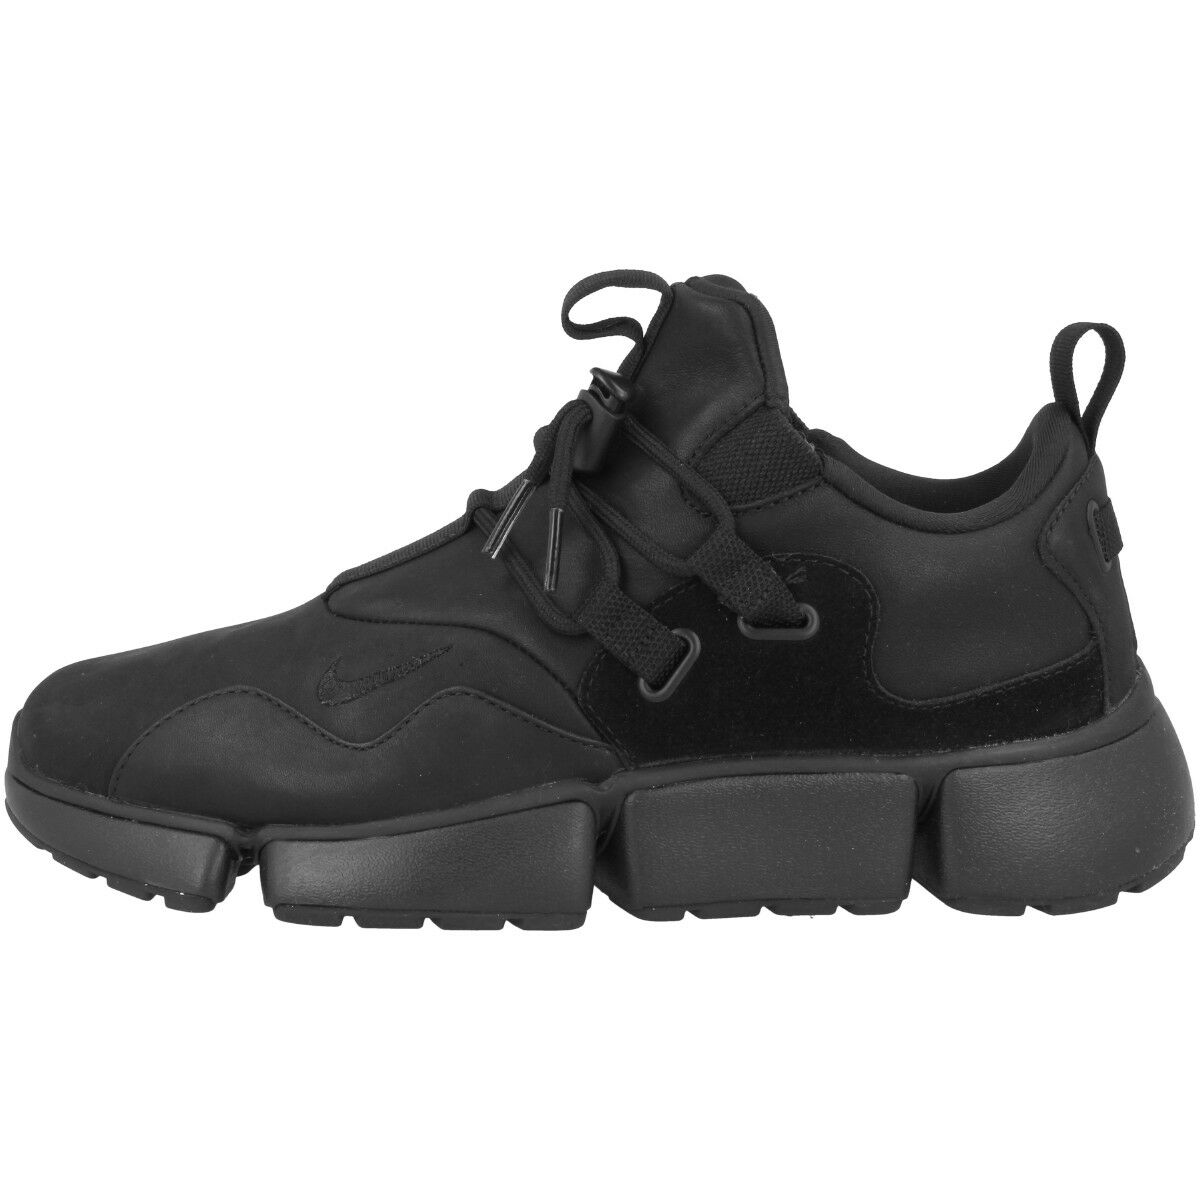 Nike Nike Nike Tasca Coltello Dm pelle Scarpe Dinamico Movimento scarpe da ginnastica da Corsa | Di Alta Qualità E Low Overhead  | Sig/Sig Ra Scarpa  9b1531